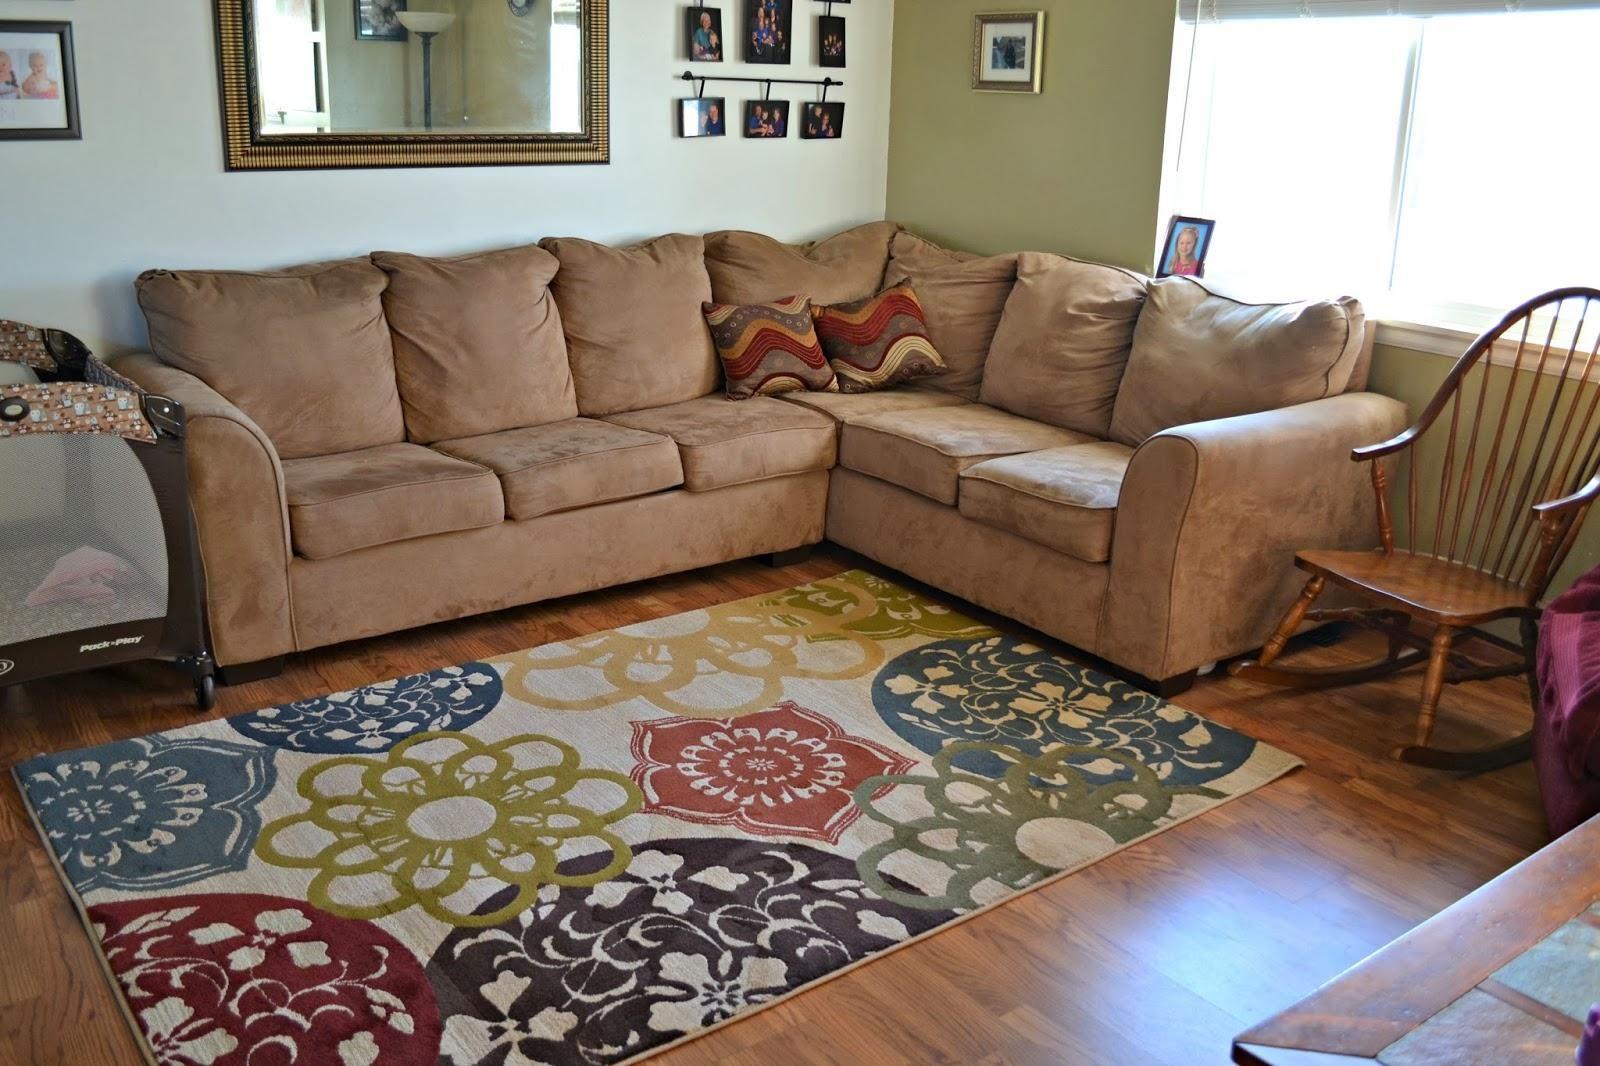 Mohawk Home Rug Review & Giveaway ilovemymohawkrug